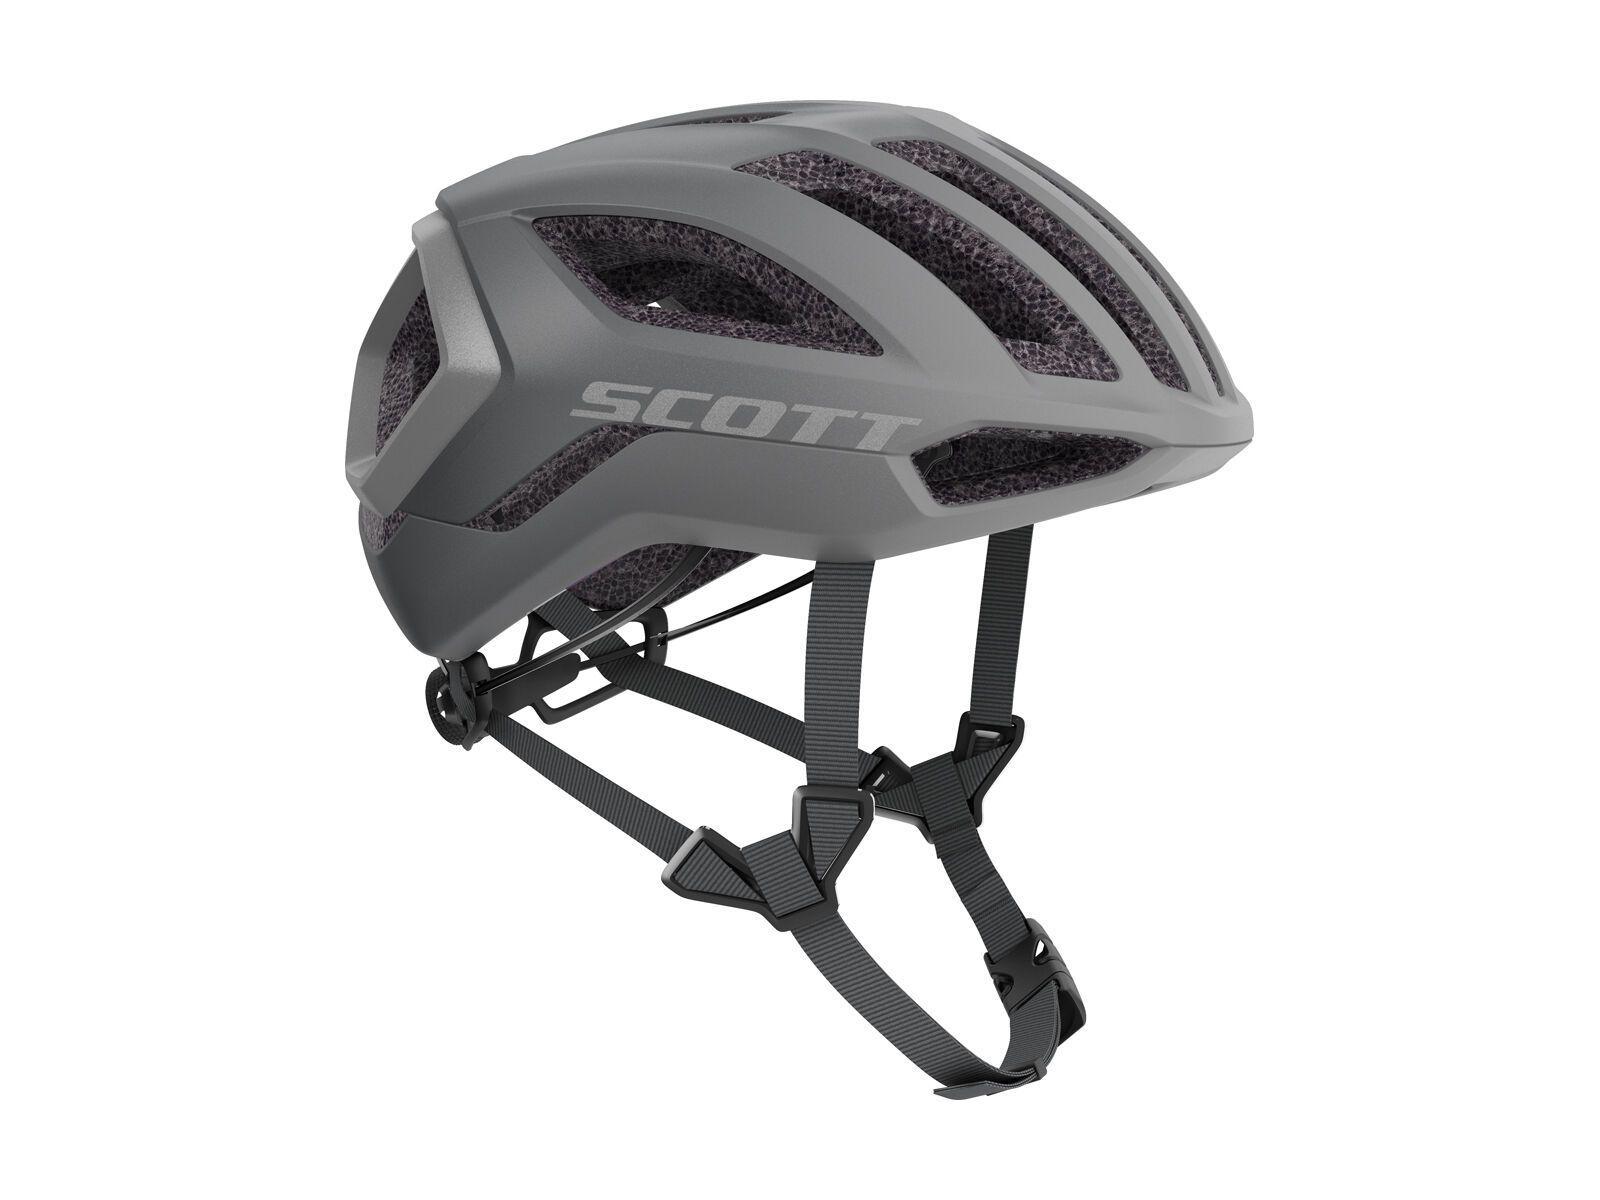 Scott Centric Plus Helmet, vogue silver/reflective | Bild 1